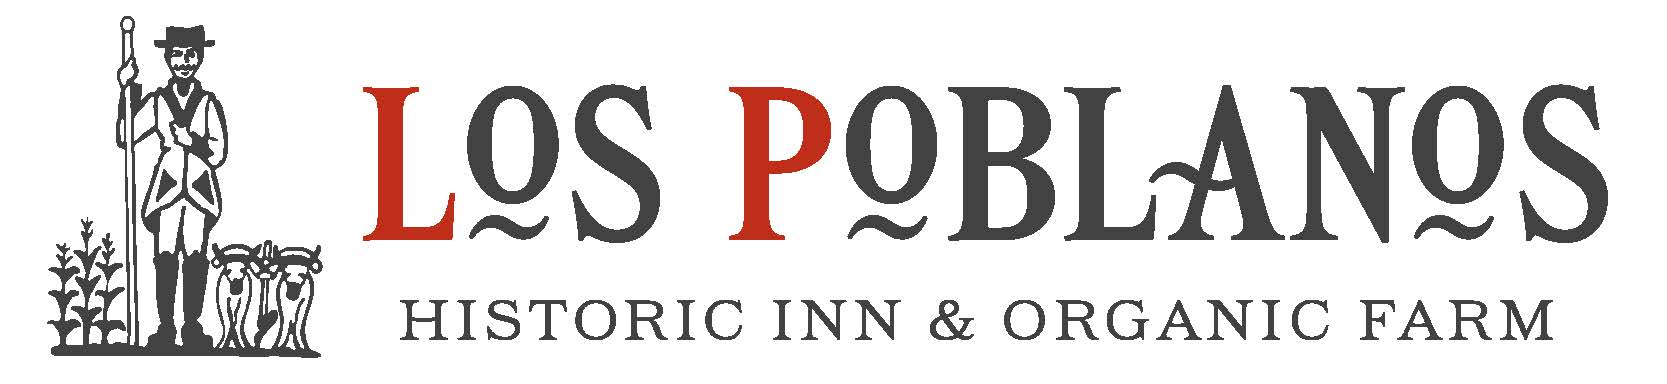 LP_horz_logo_2014_600px.jpg